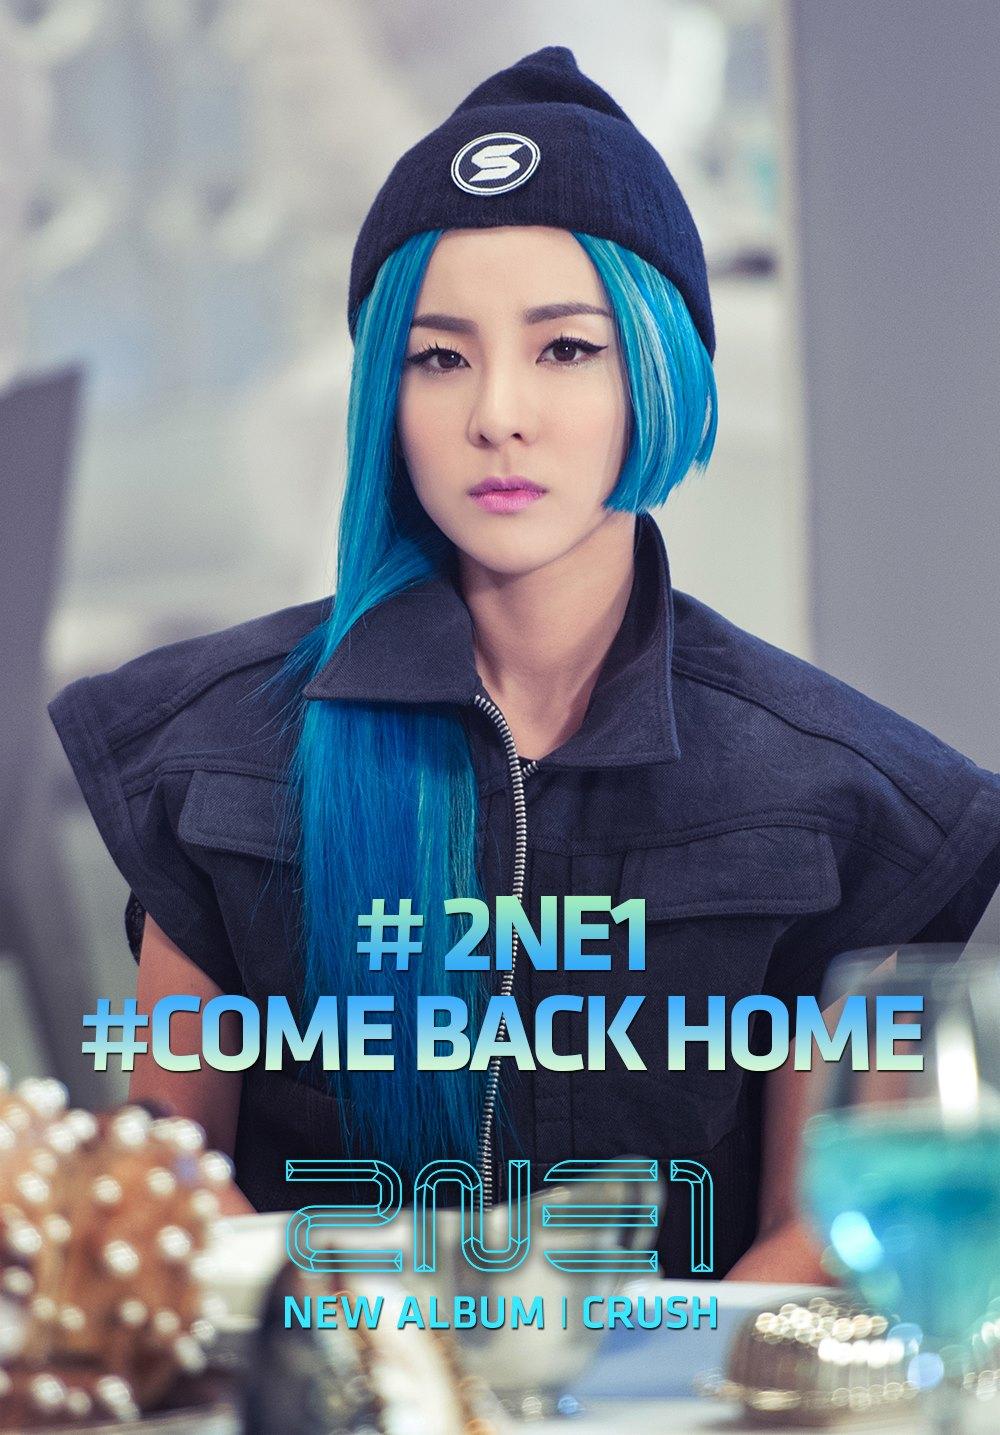 image 2ne1 come back home dara promo 4 jpg asian entertainment